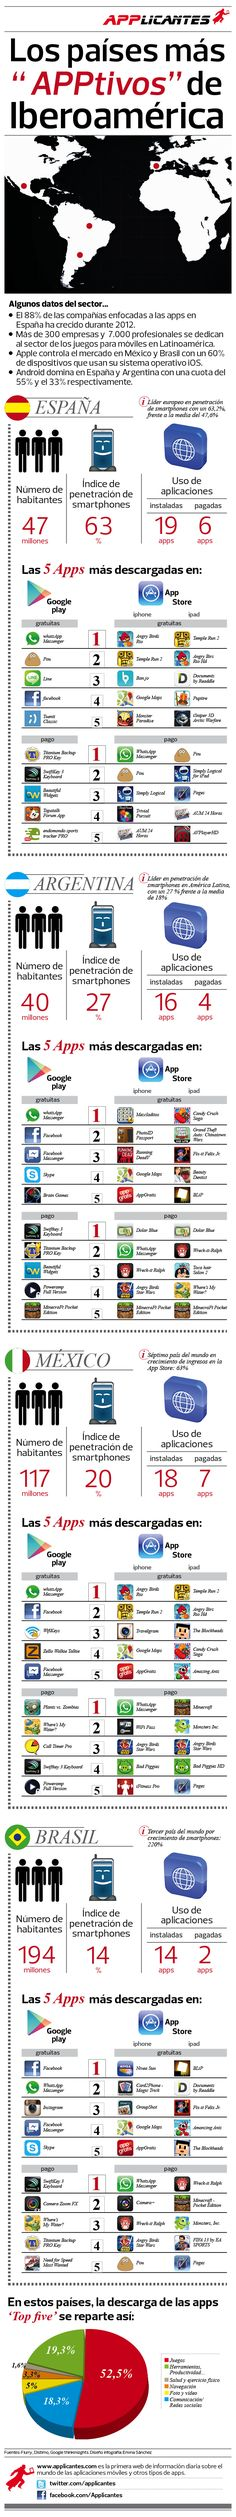 Las APPS en Iberoamérica #infografia #infographic #software